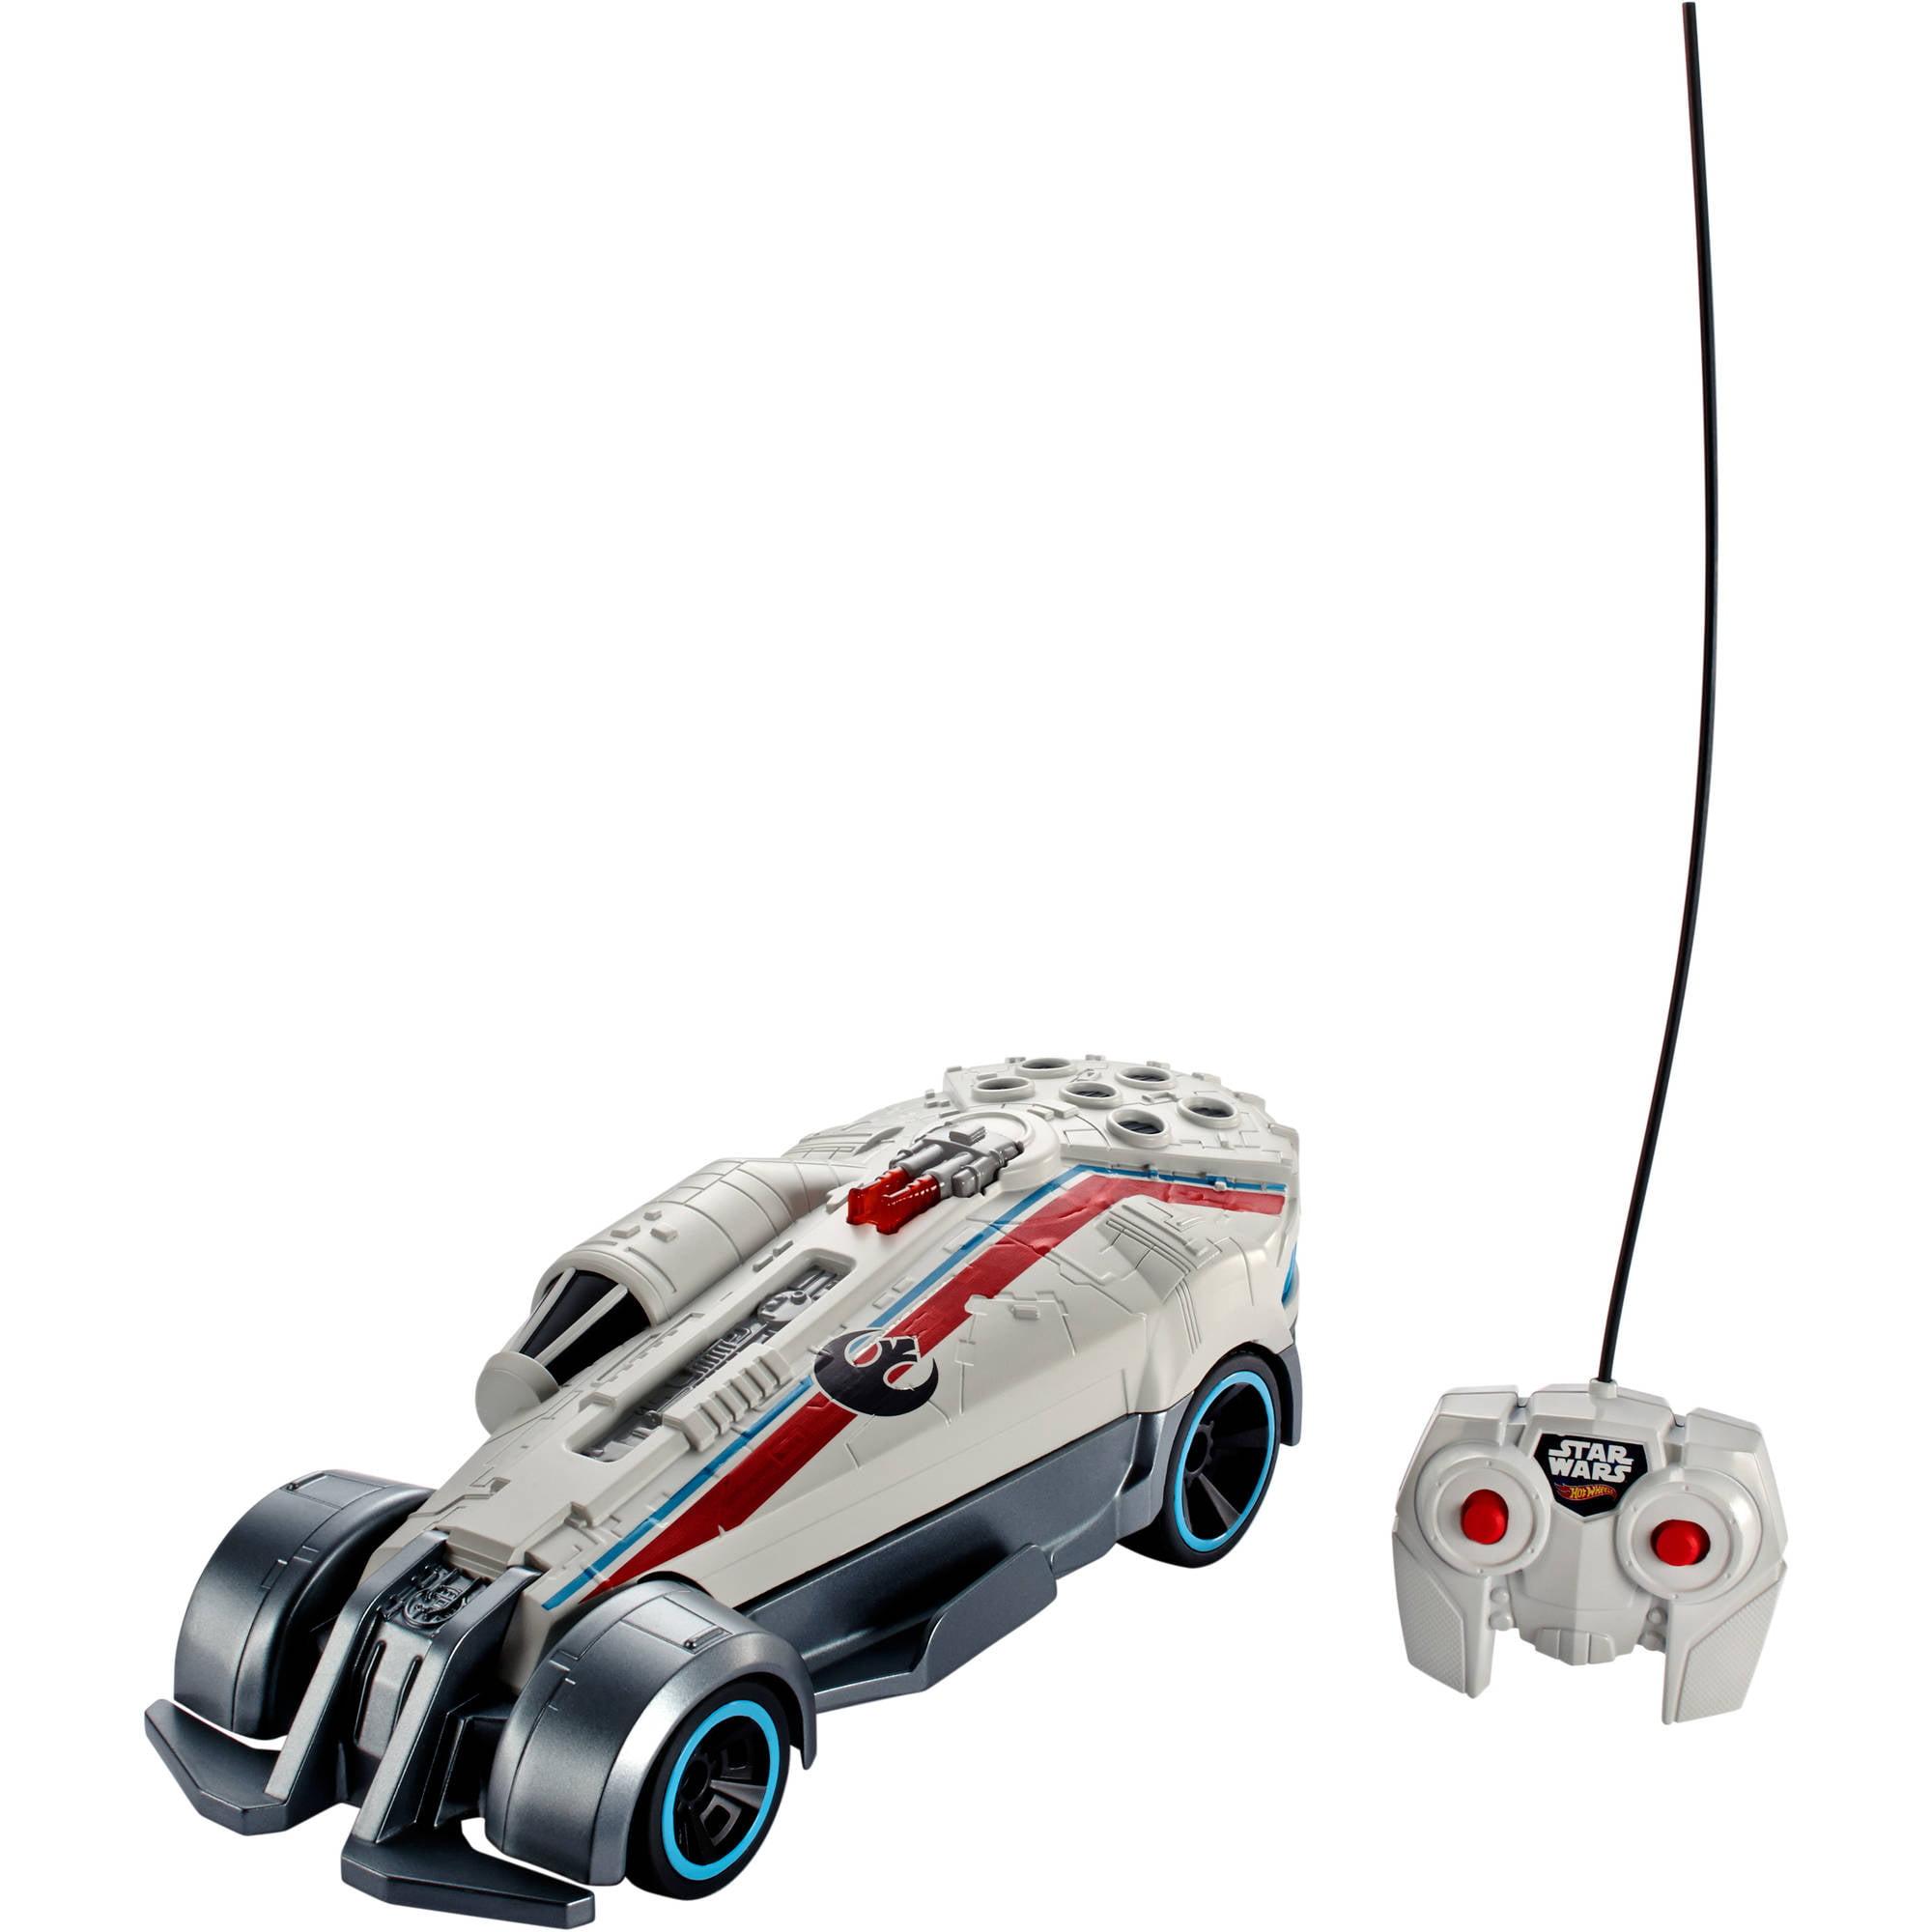 Hot Wheels RC Star Wars Millenium Falcon Carship